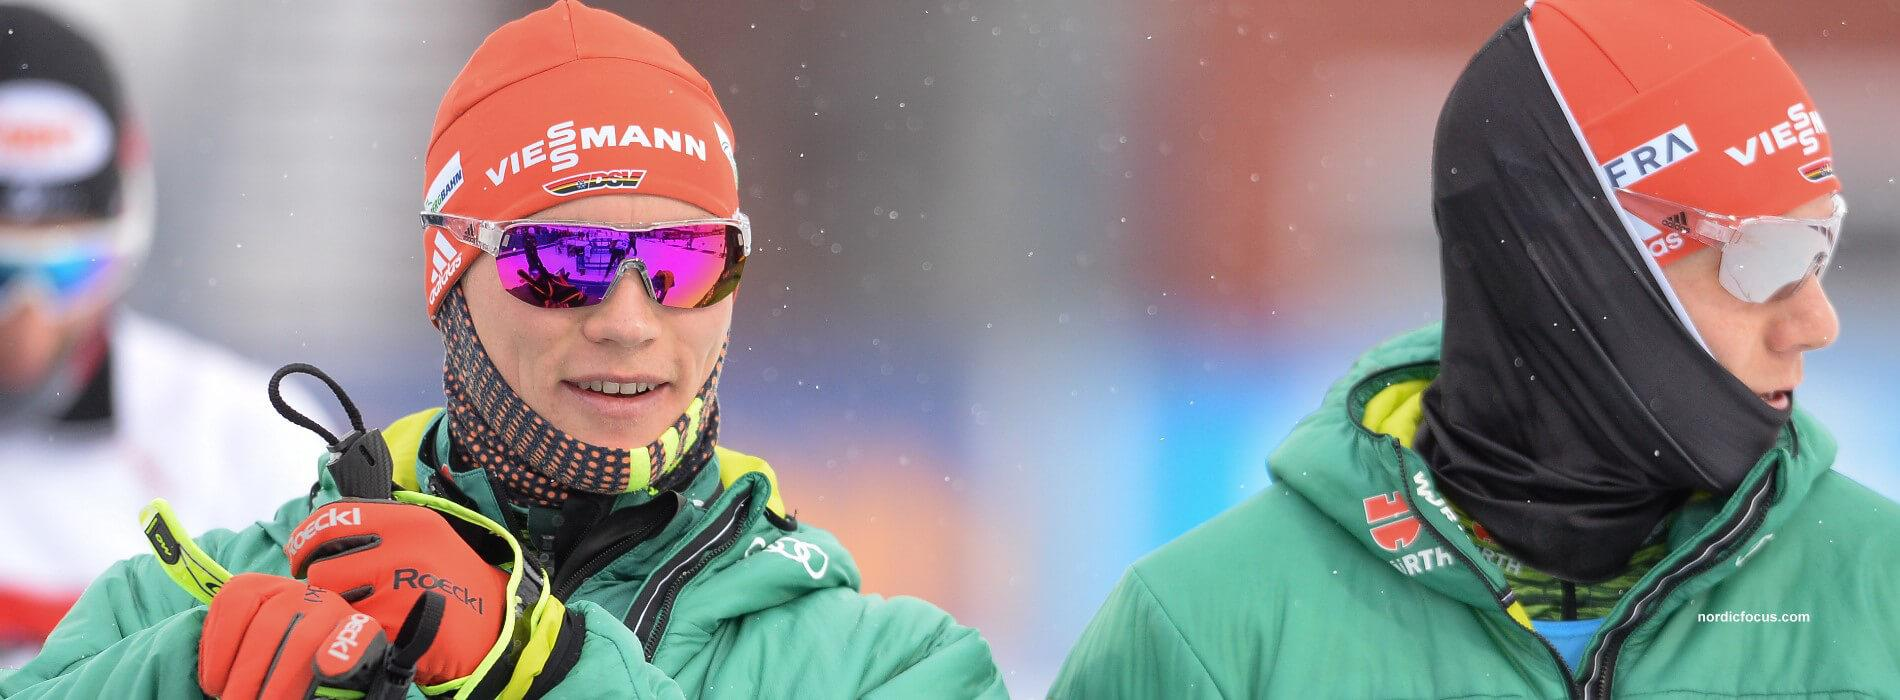 Staffel Herren Biathlon